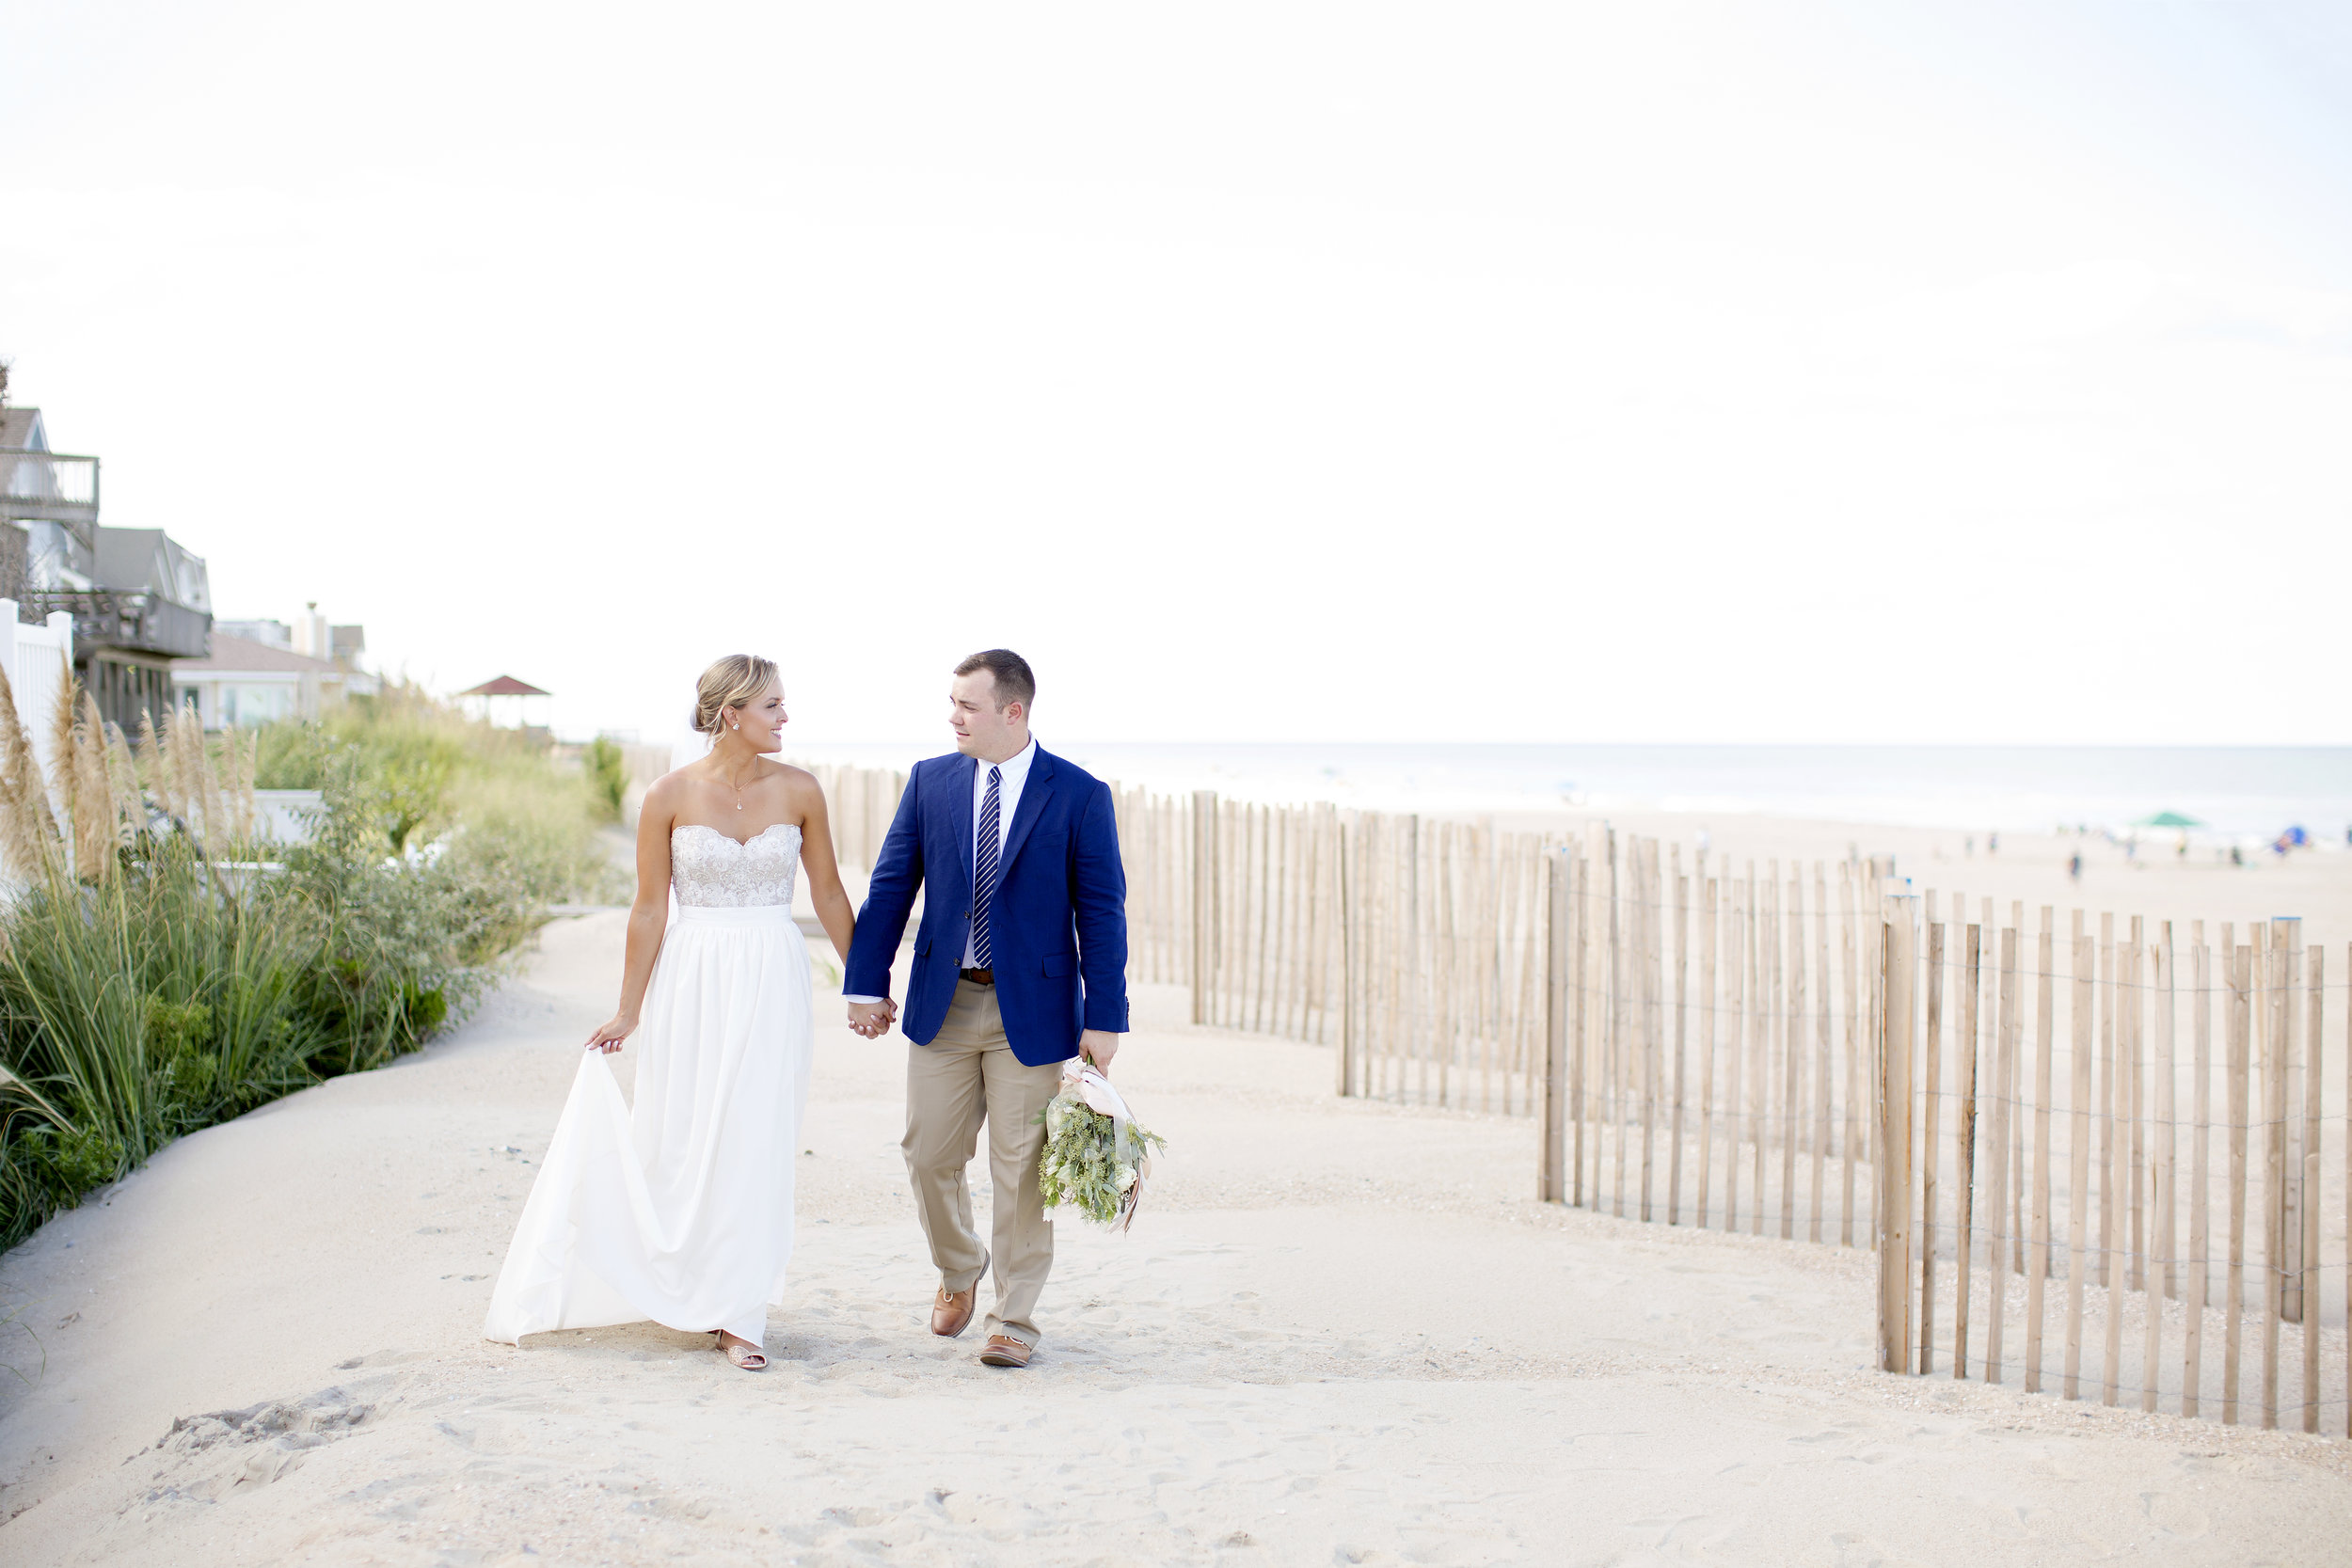 20170827_carroll_wedding_1942.jpg